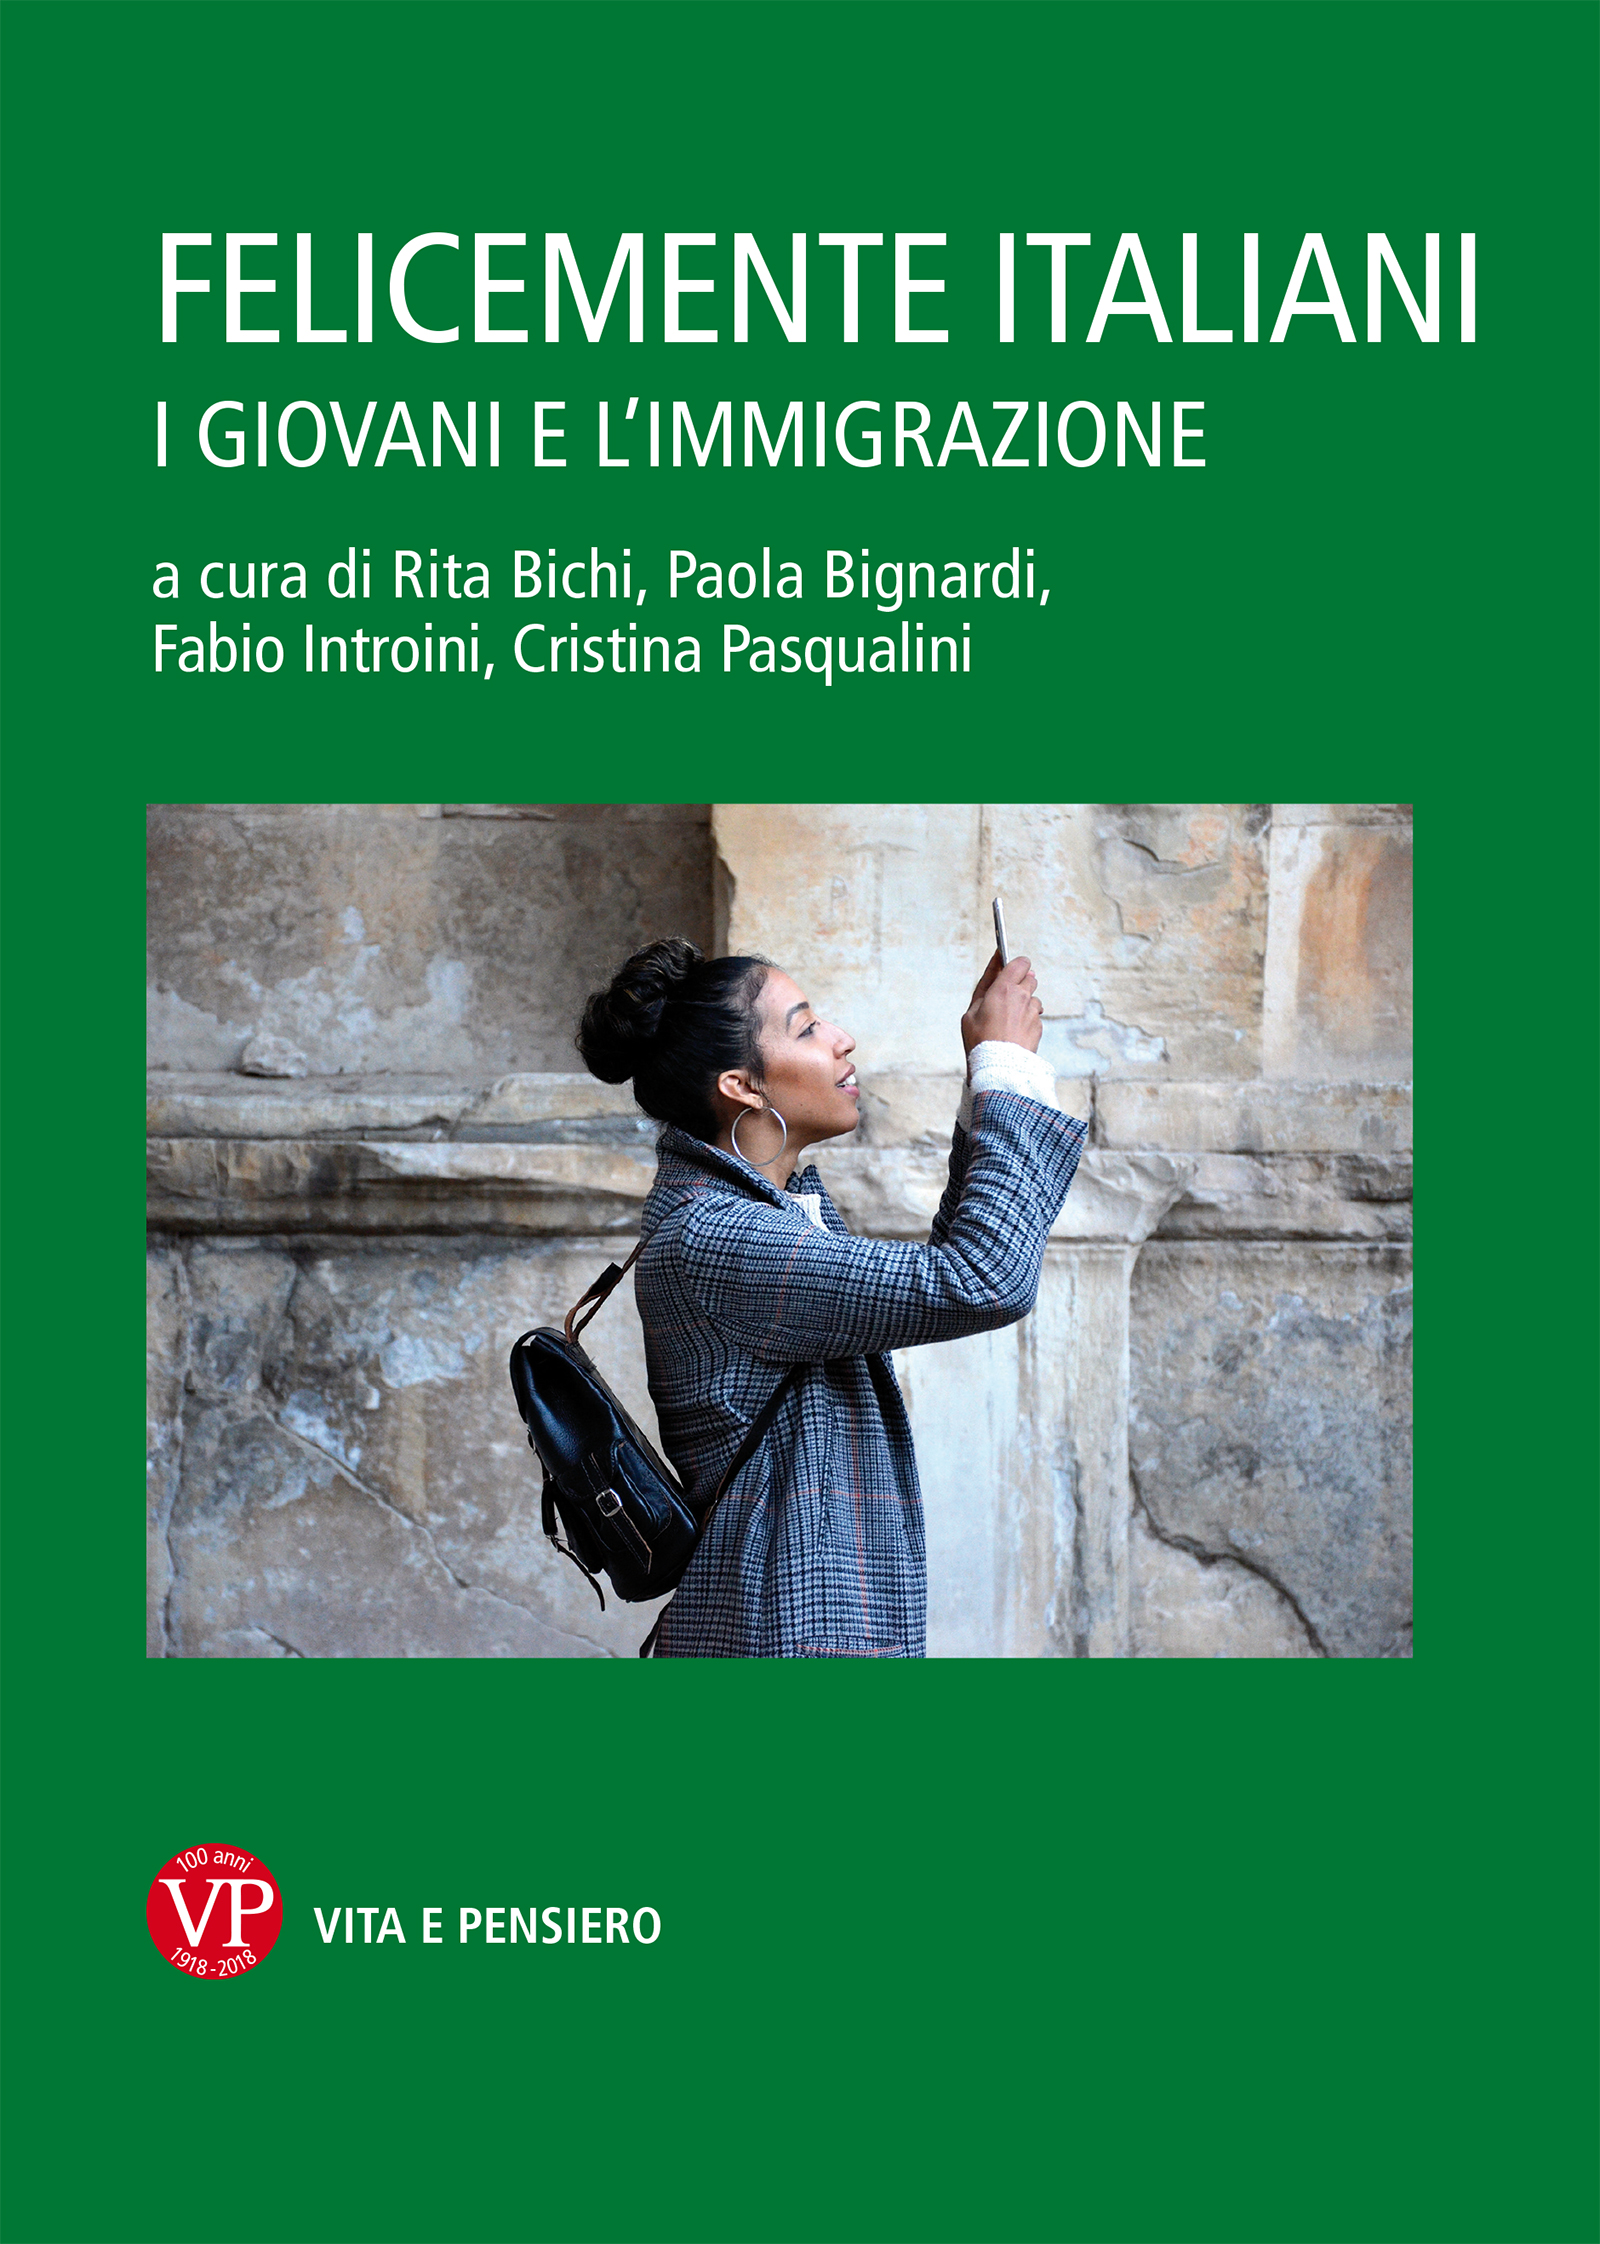 felicemente-italiani-345976